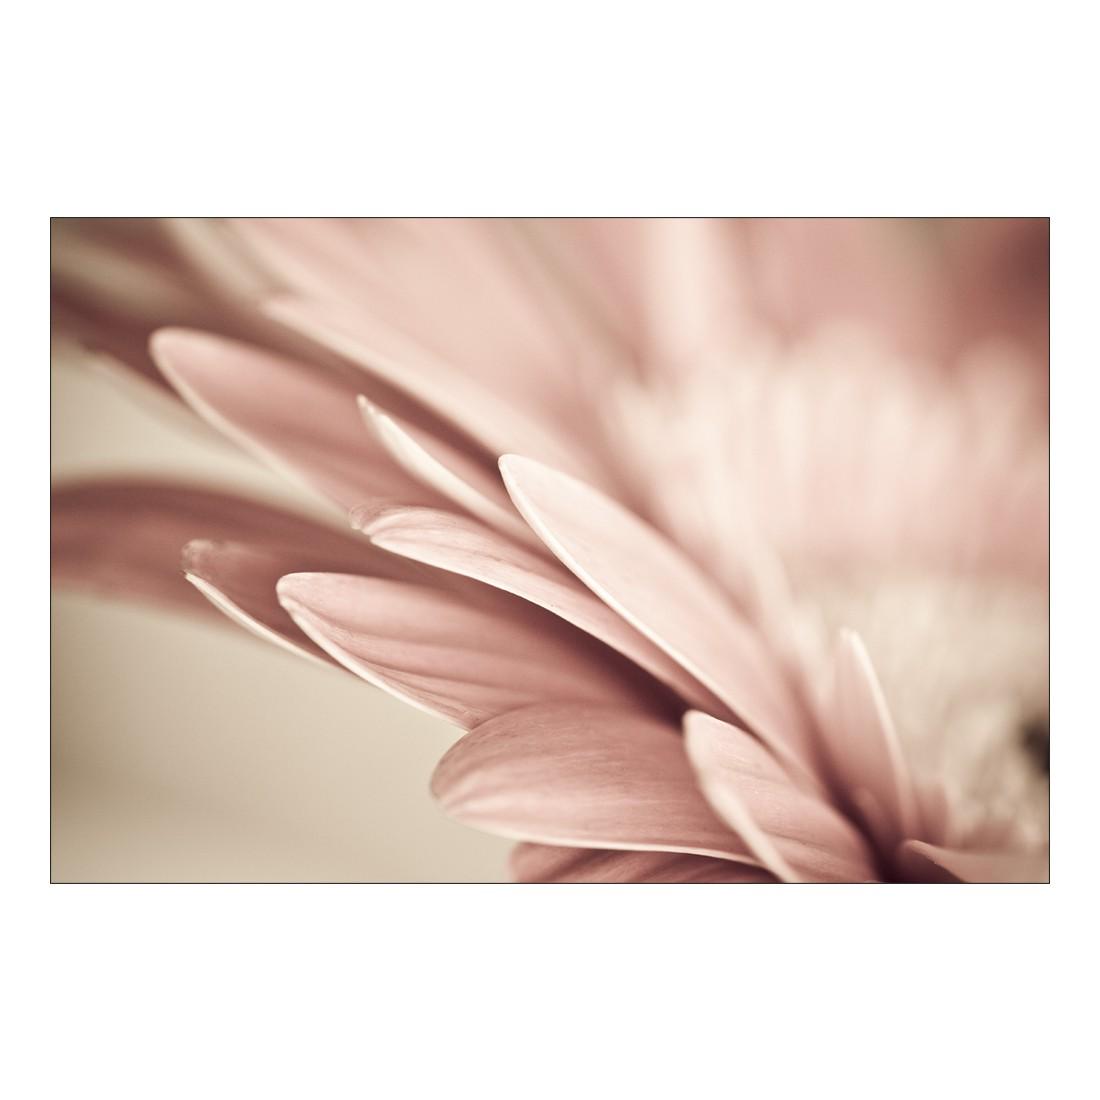 Acrylglasbild Retro Flower – Abmessung 30×20 cm, Gallery of Innovative Art bestellen